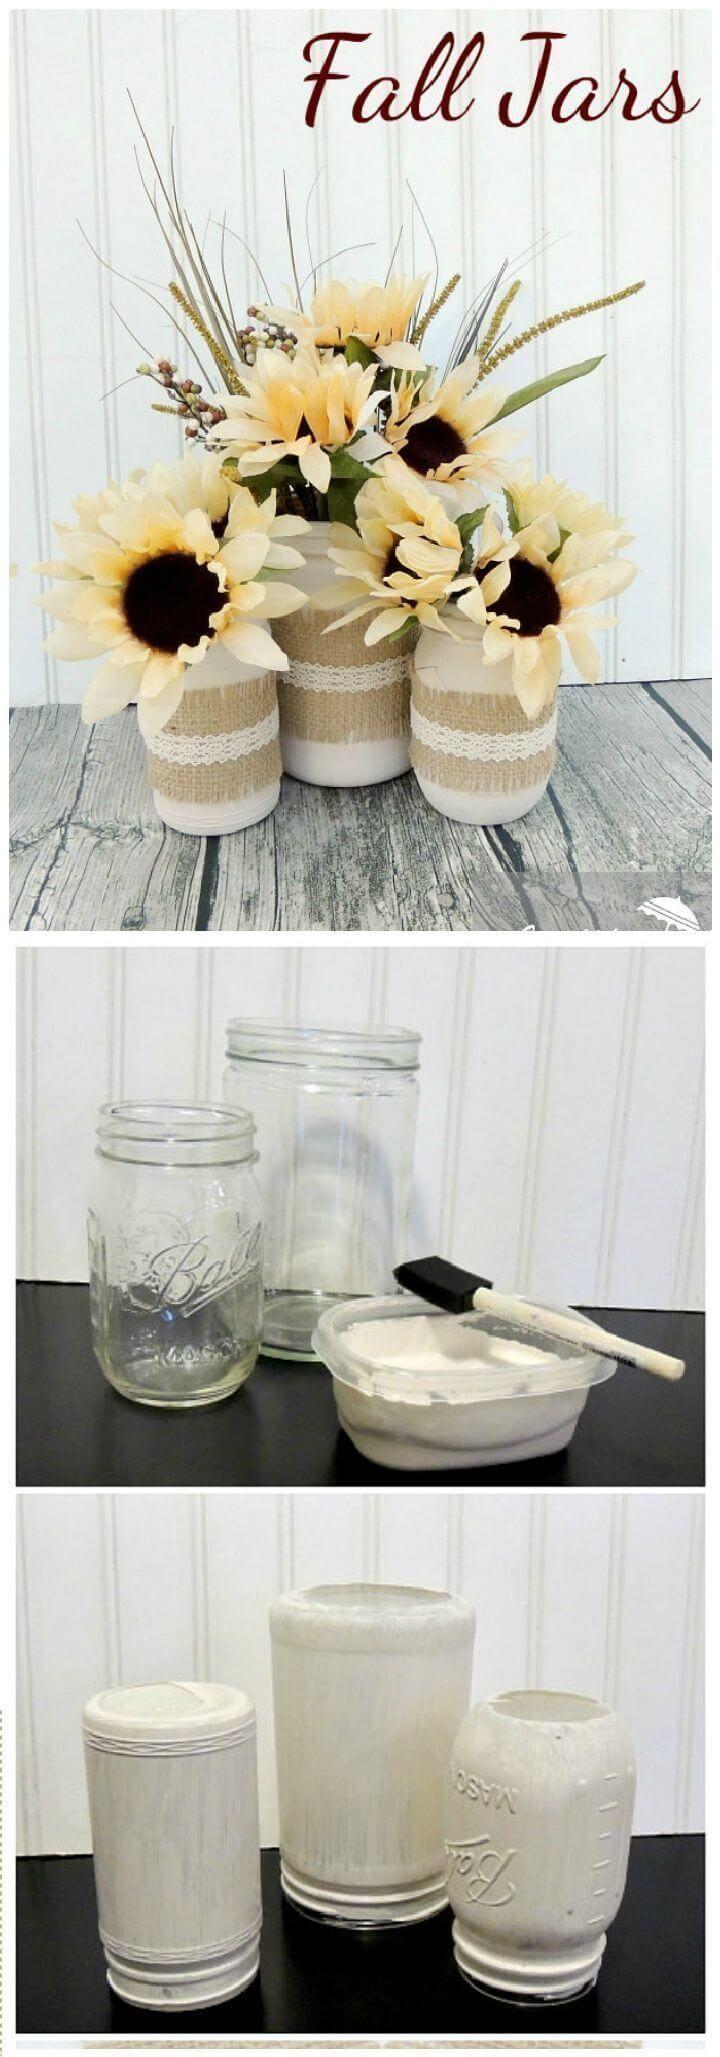 Painted White Mason Jars with Burlap -   24 mason jar burlap ideas